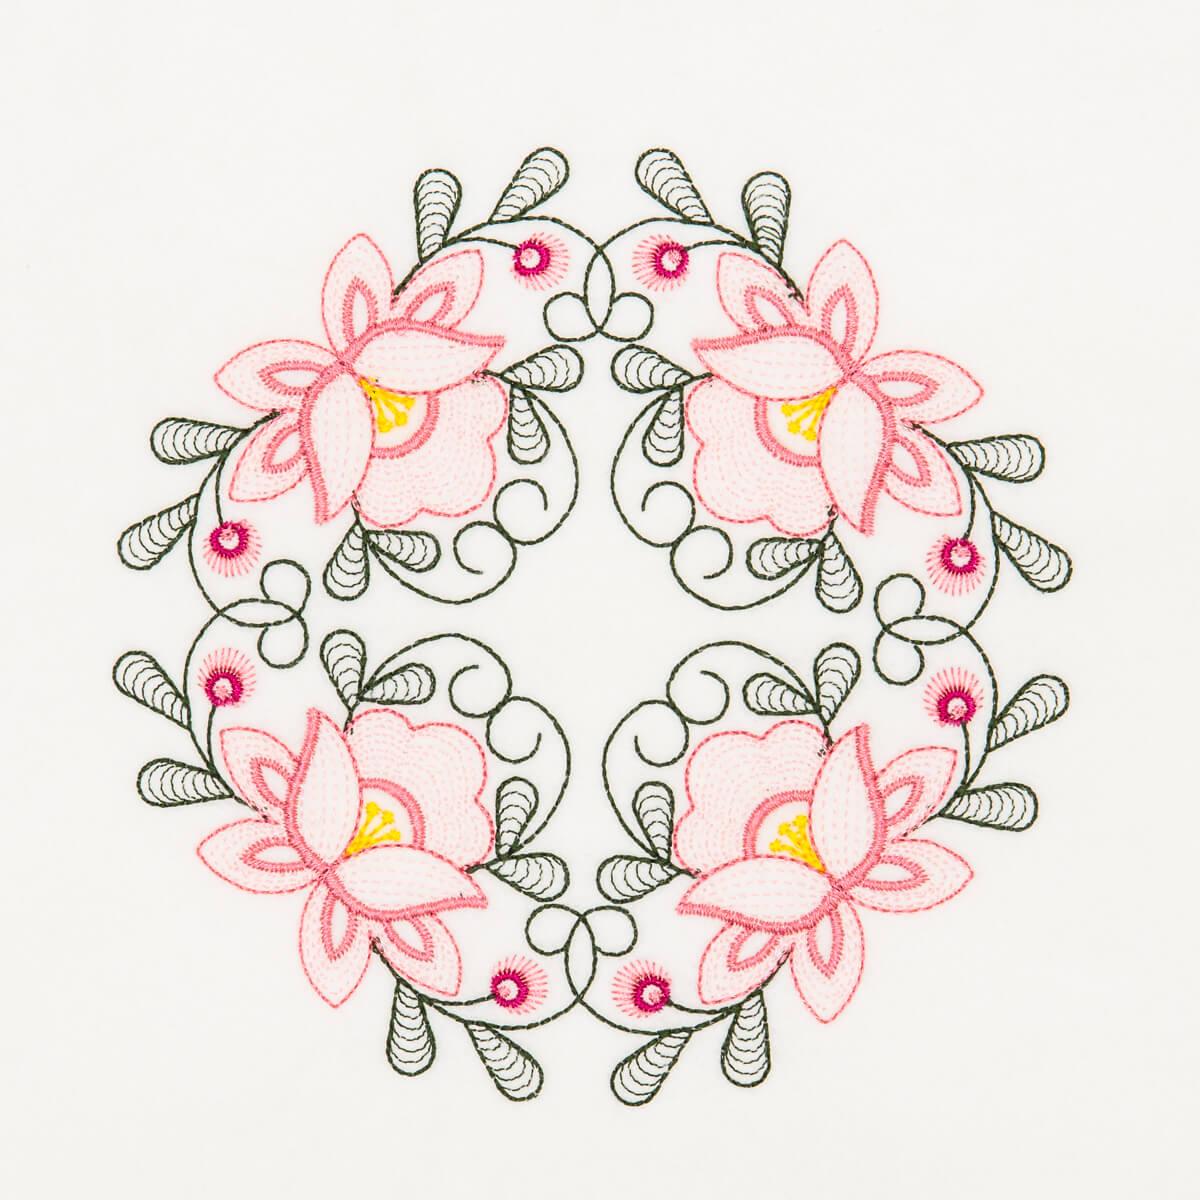 Matriz de bordado floral rippled 13